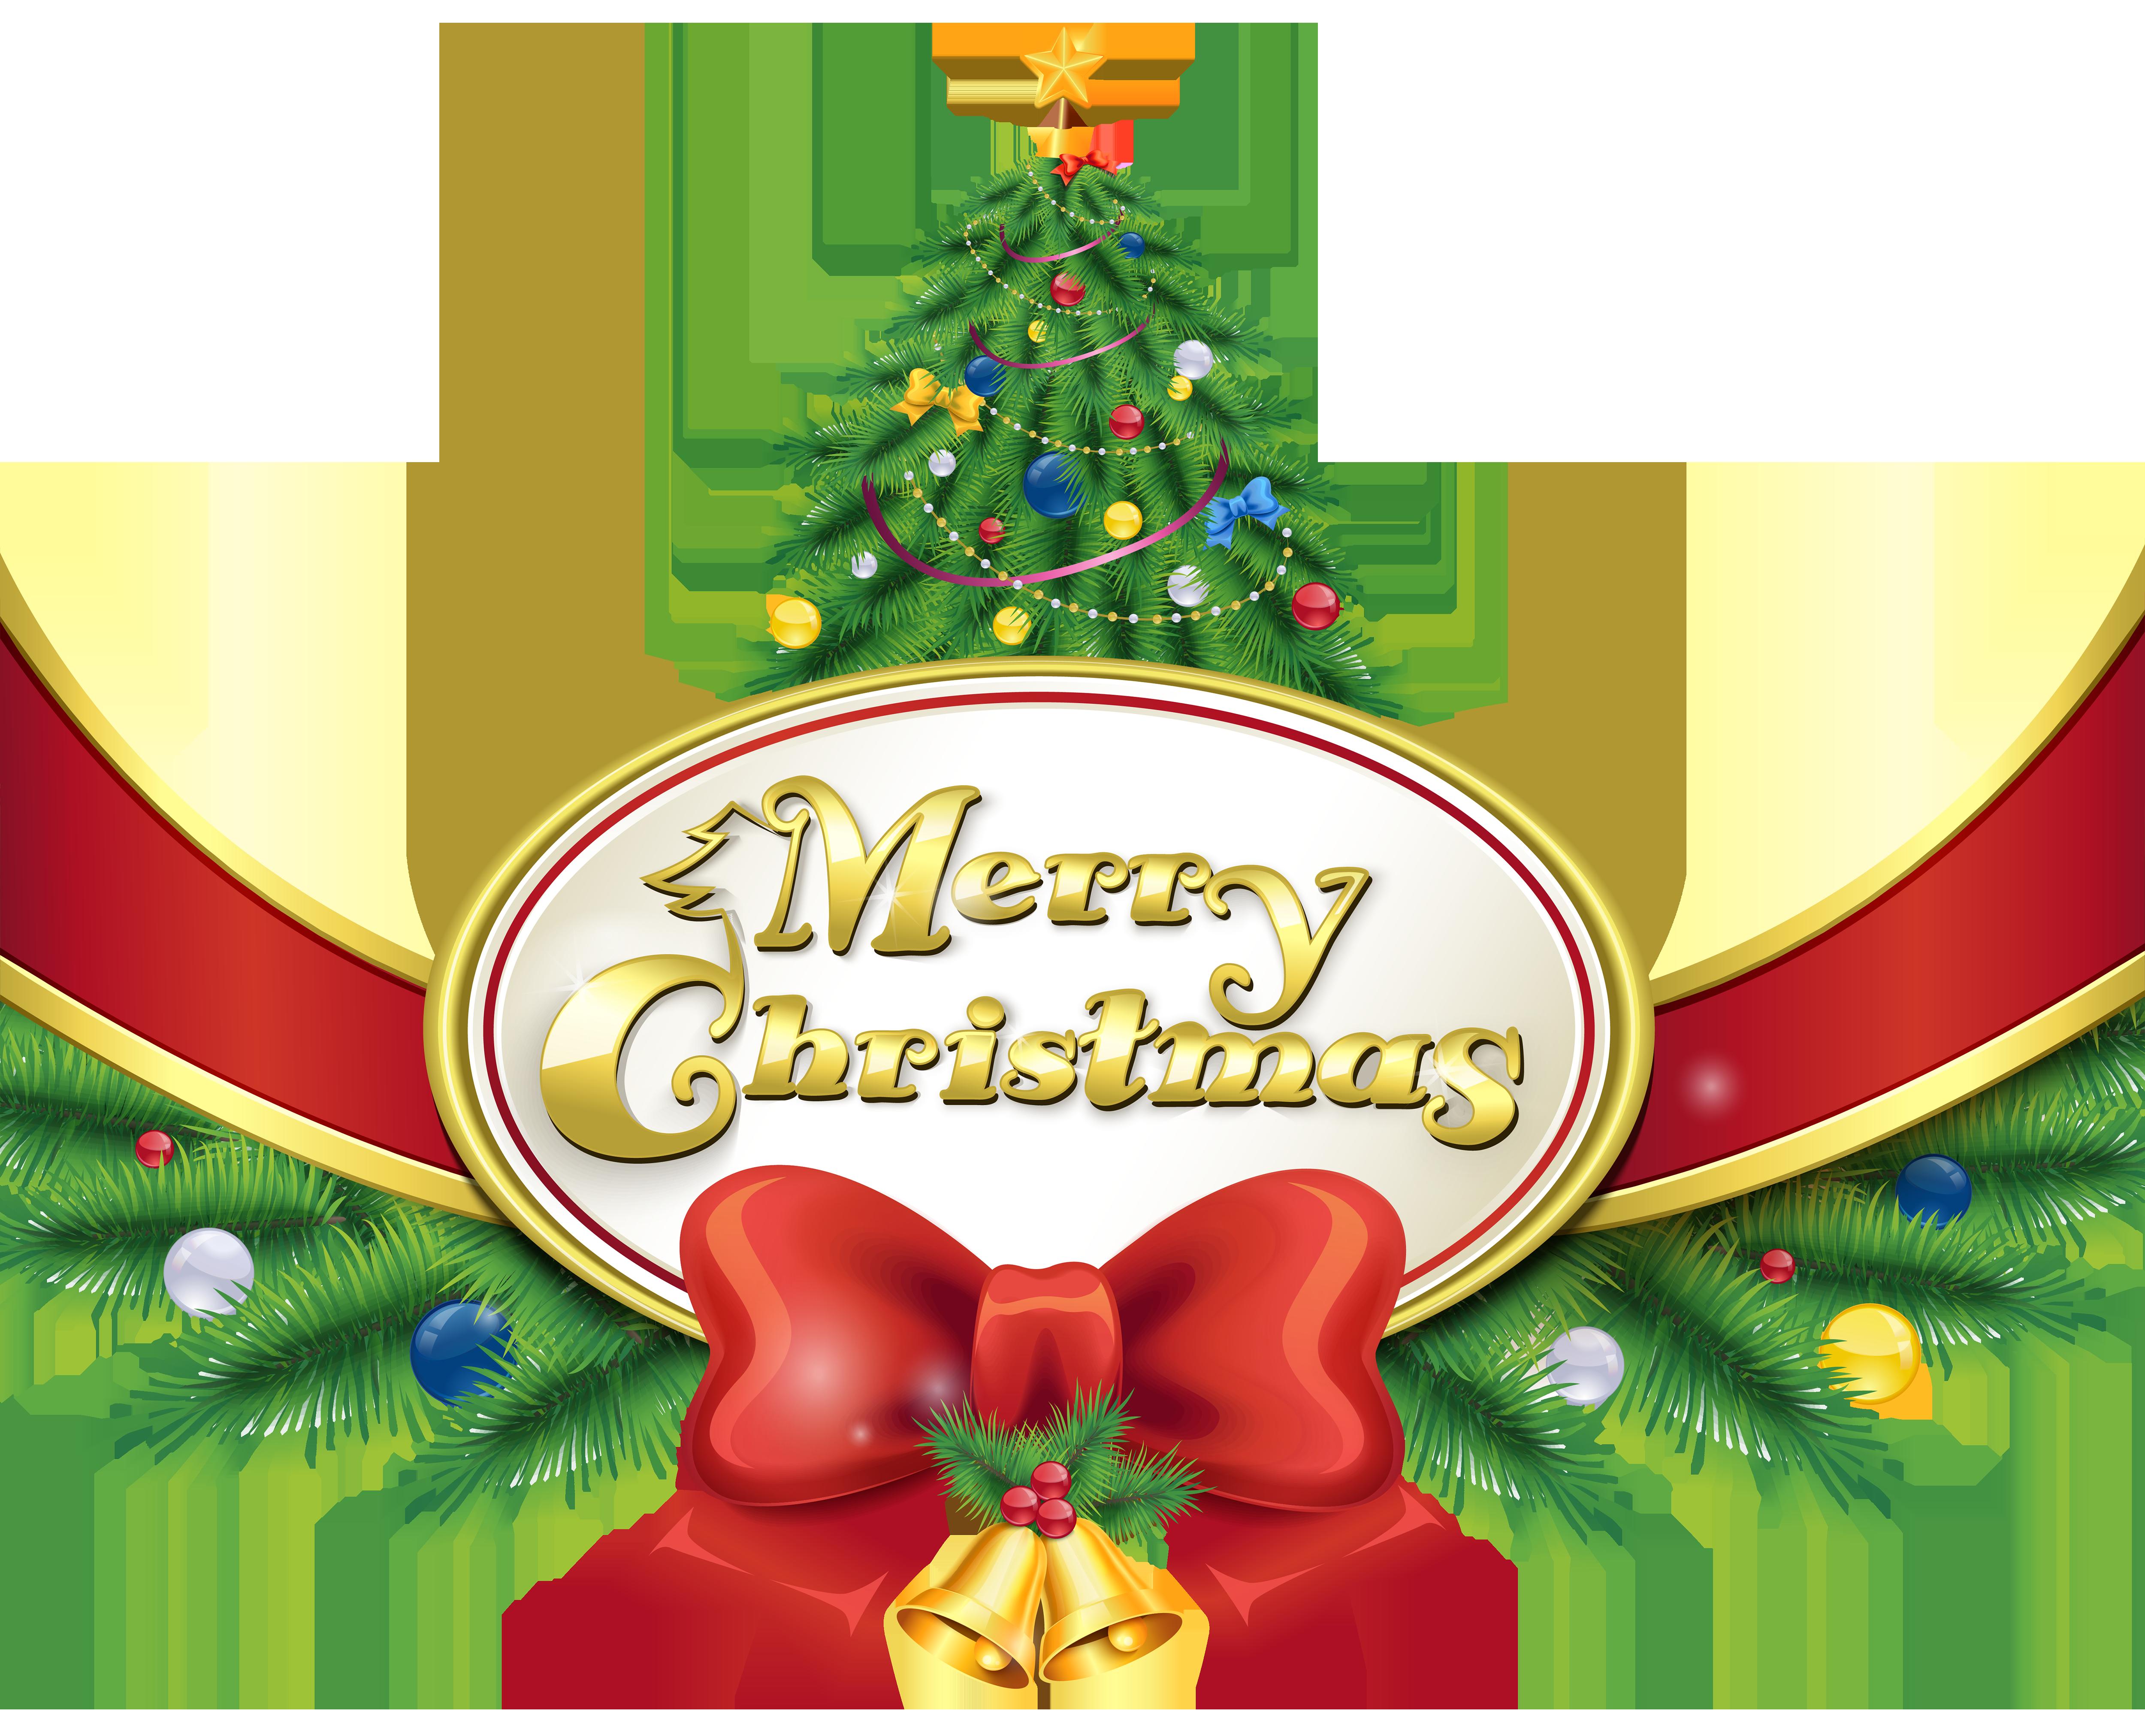 Christmas Eve Santa Claus Merry Christmas, Happy Holidays.